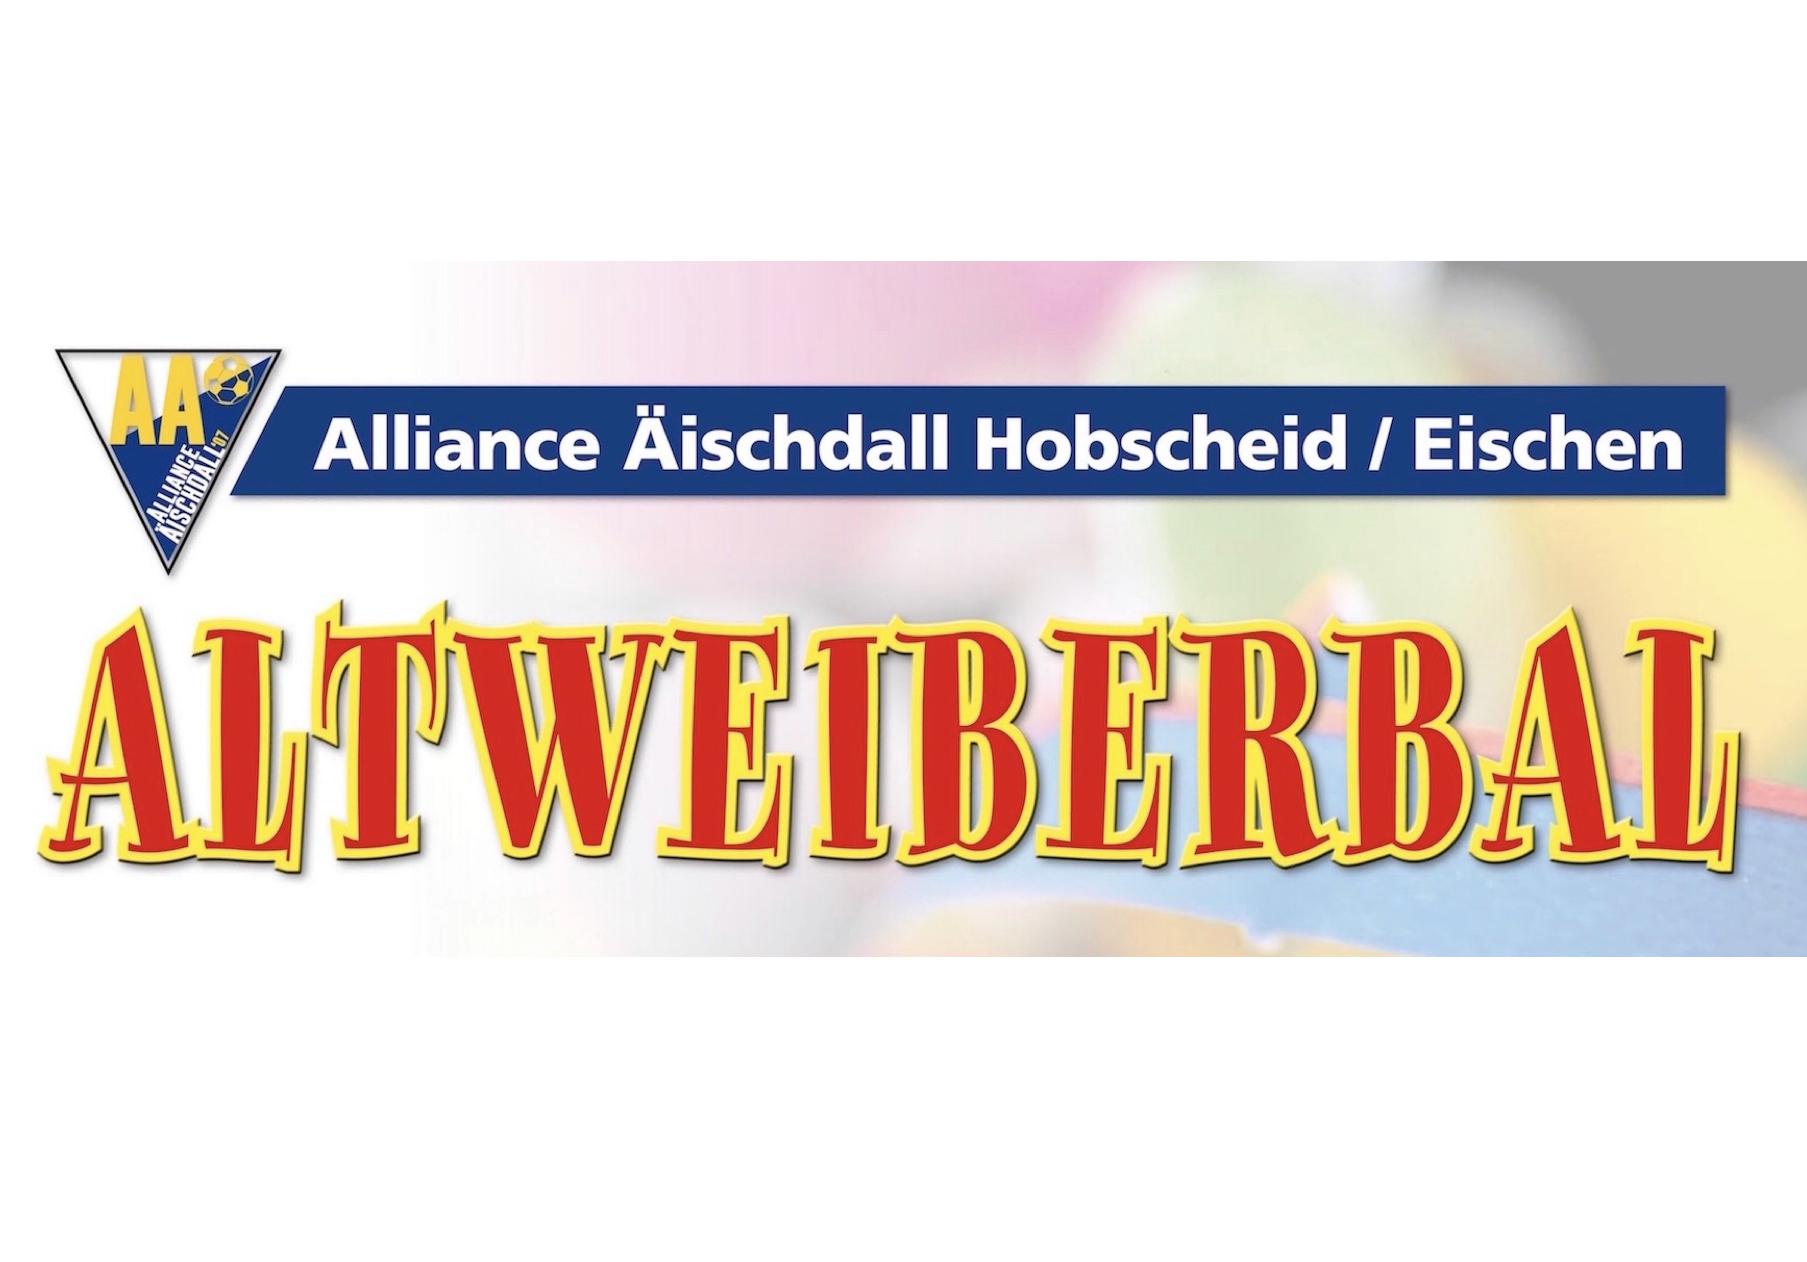 Altweiberbal 20-02-20